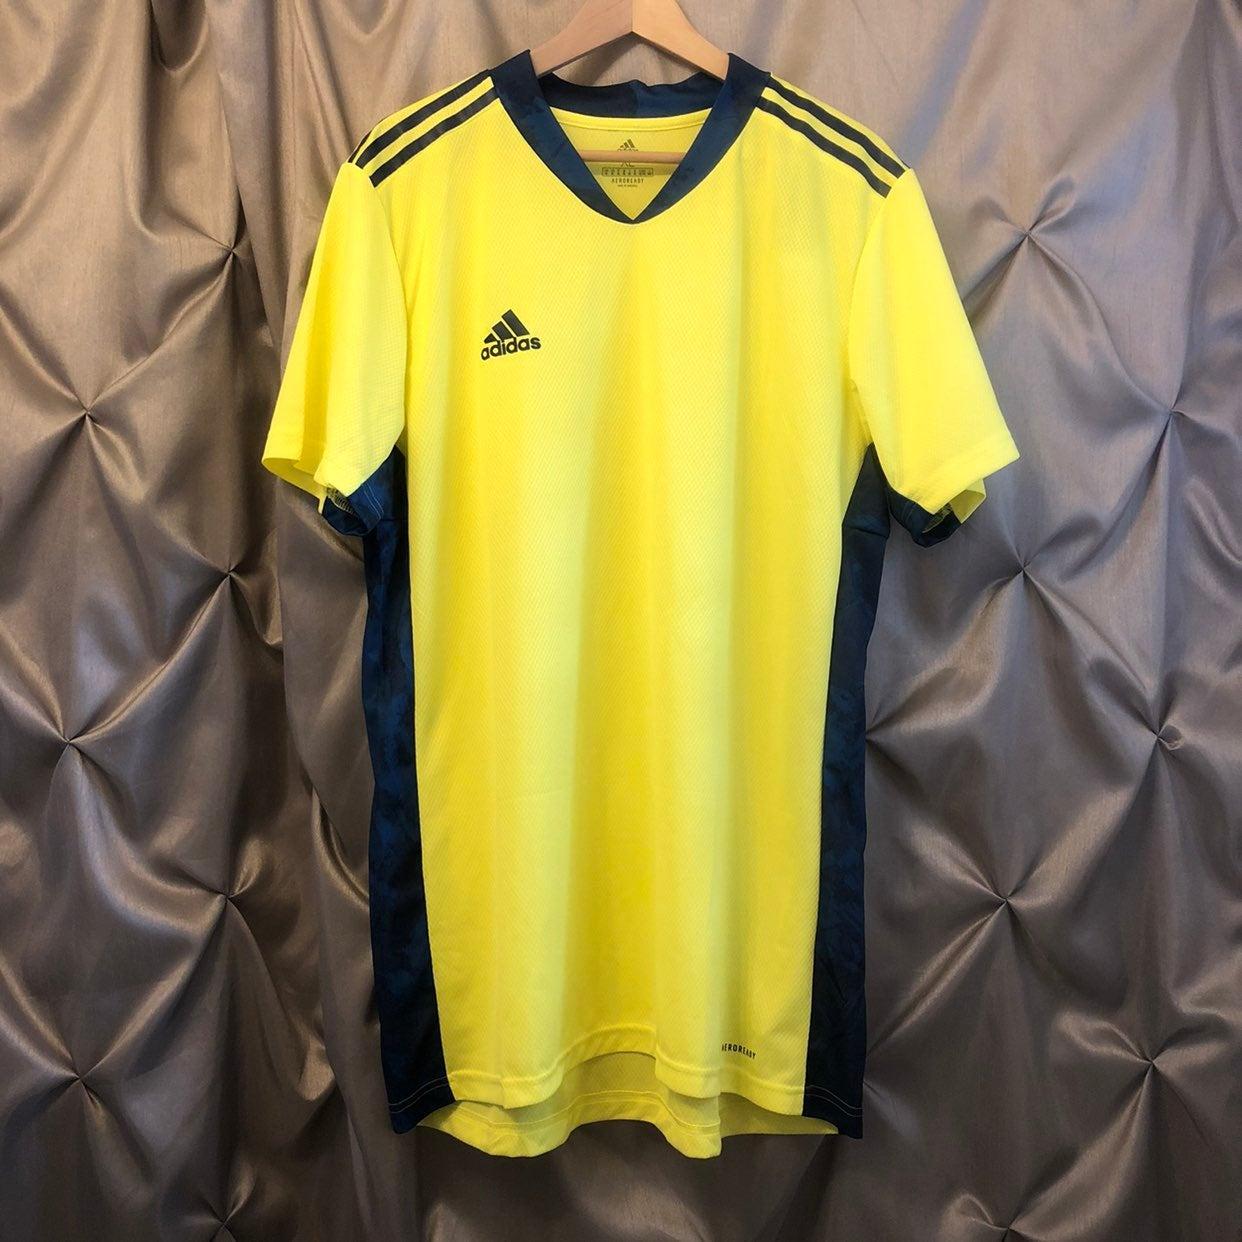 Adidas Adipro 20 GK Soccer Jersey NWT